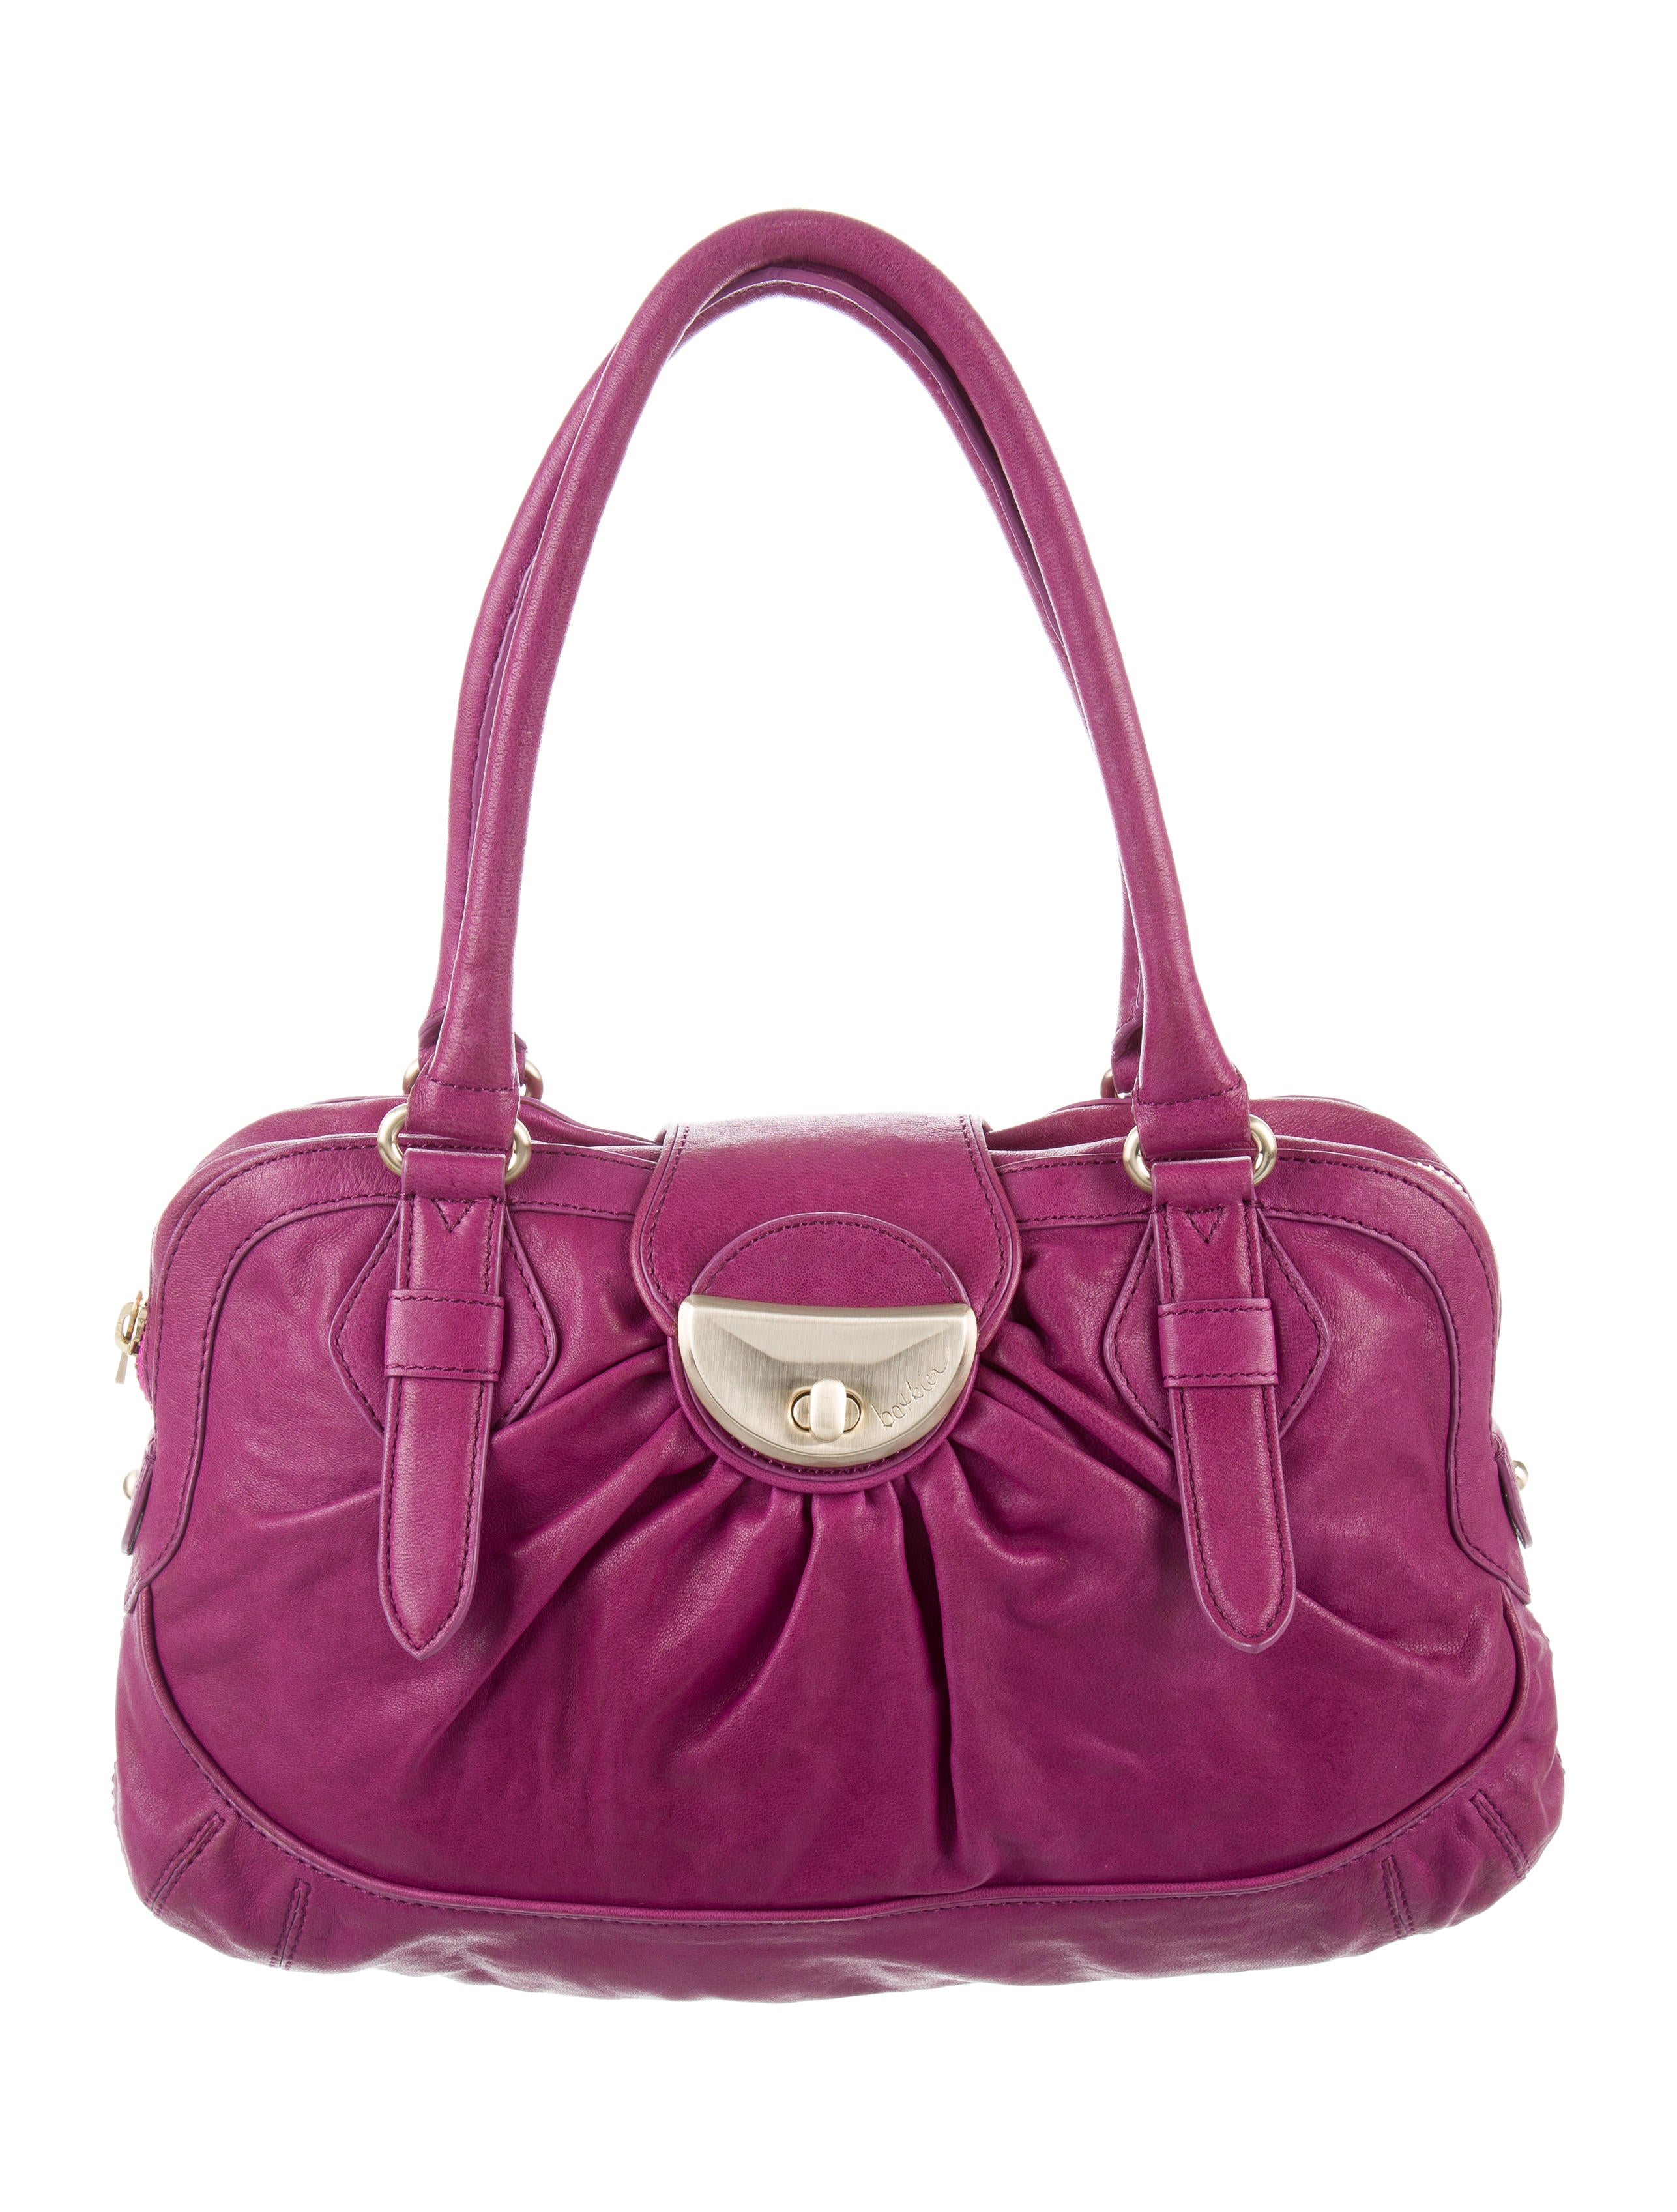 Botkier Small Lita Bag - Handbags